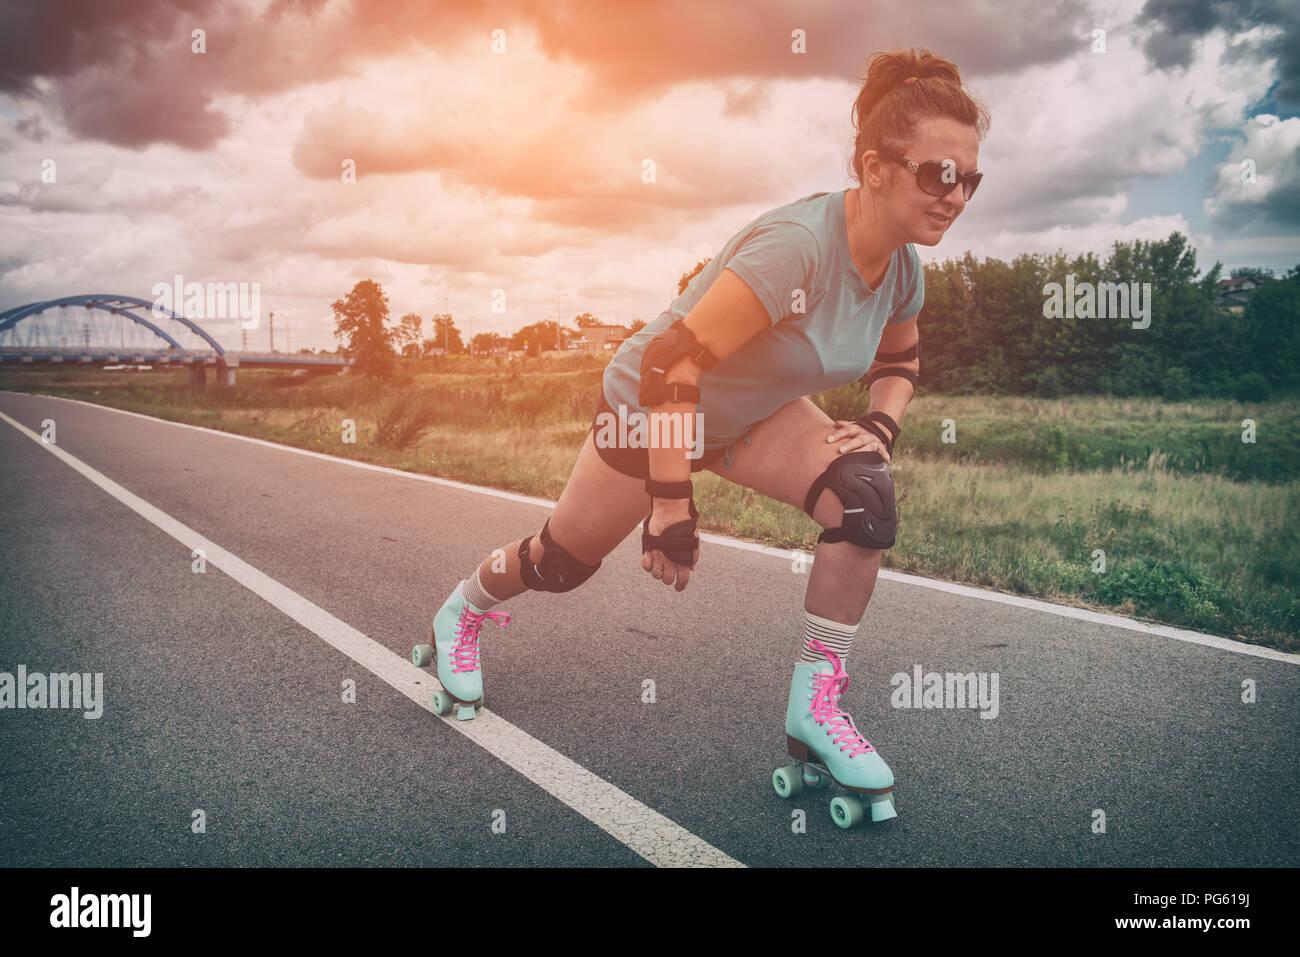 Roller Skates Stock Photos & Roller Skates Stock Images